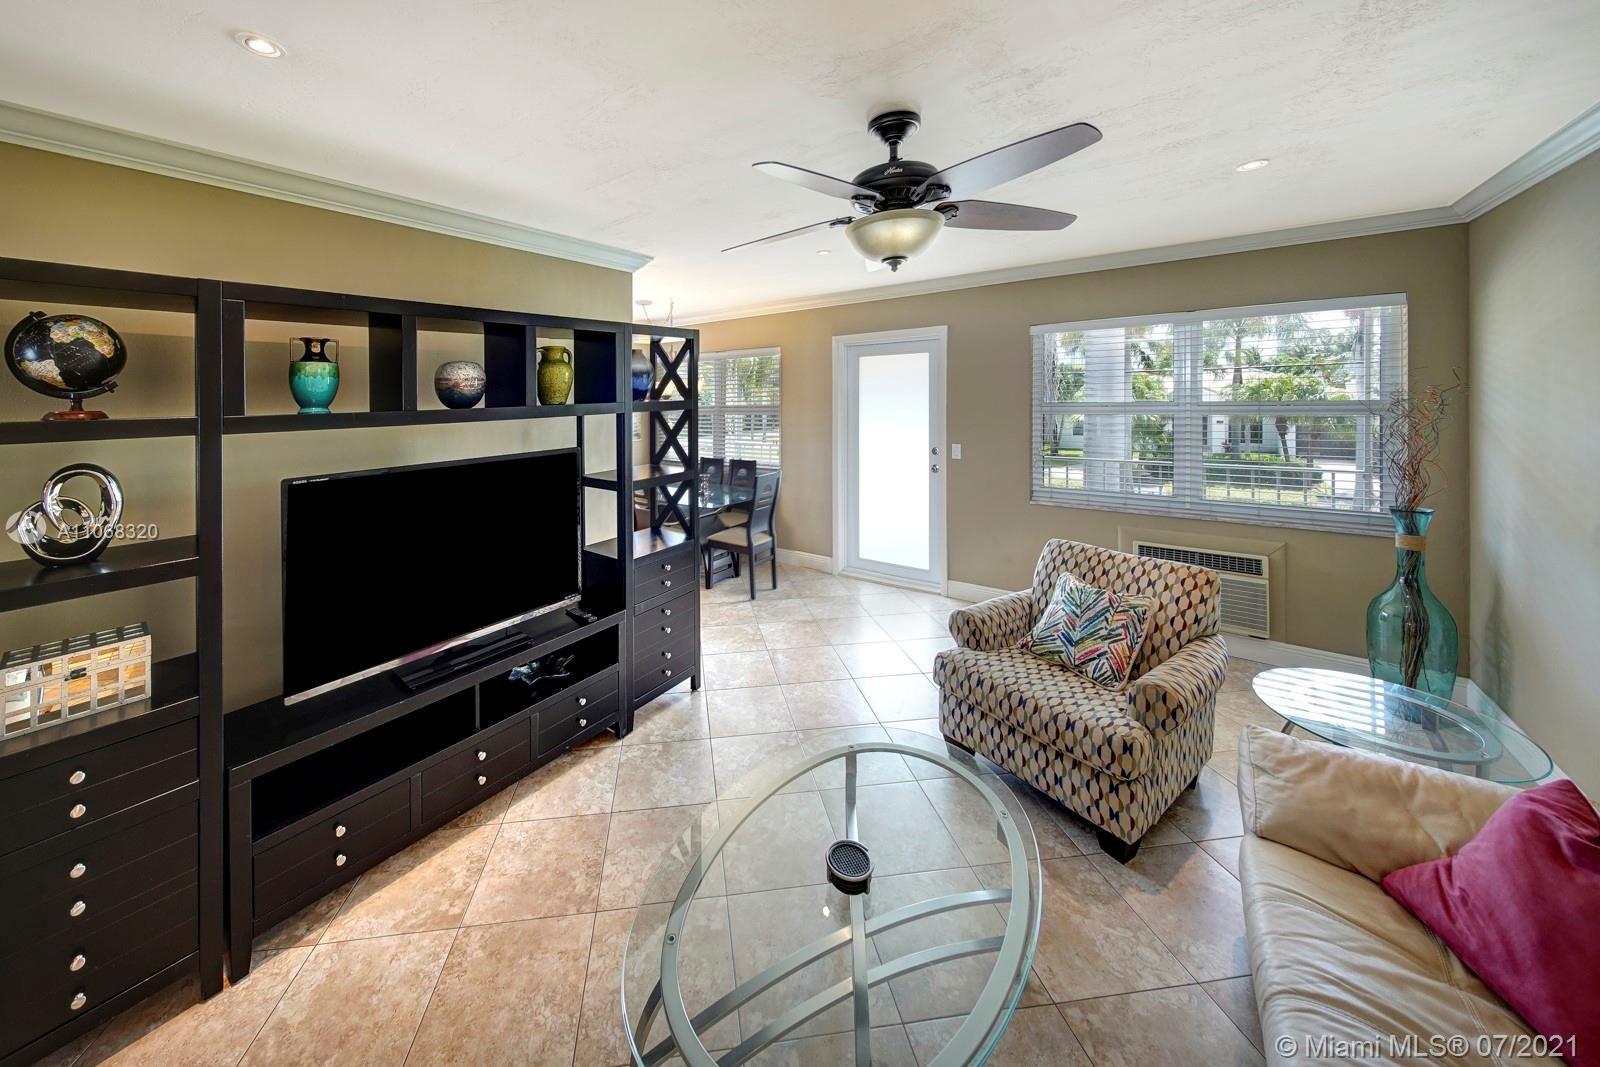 Photo of 500 Layne Blvd #20, Hallandale Beach, FL 33009 (MLS # A11068320)